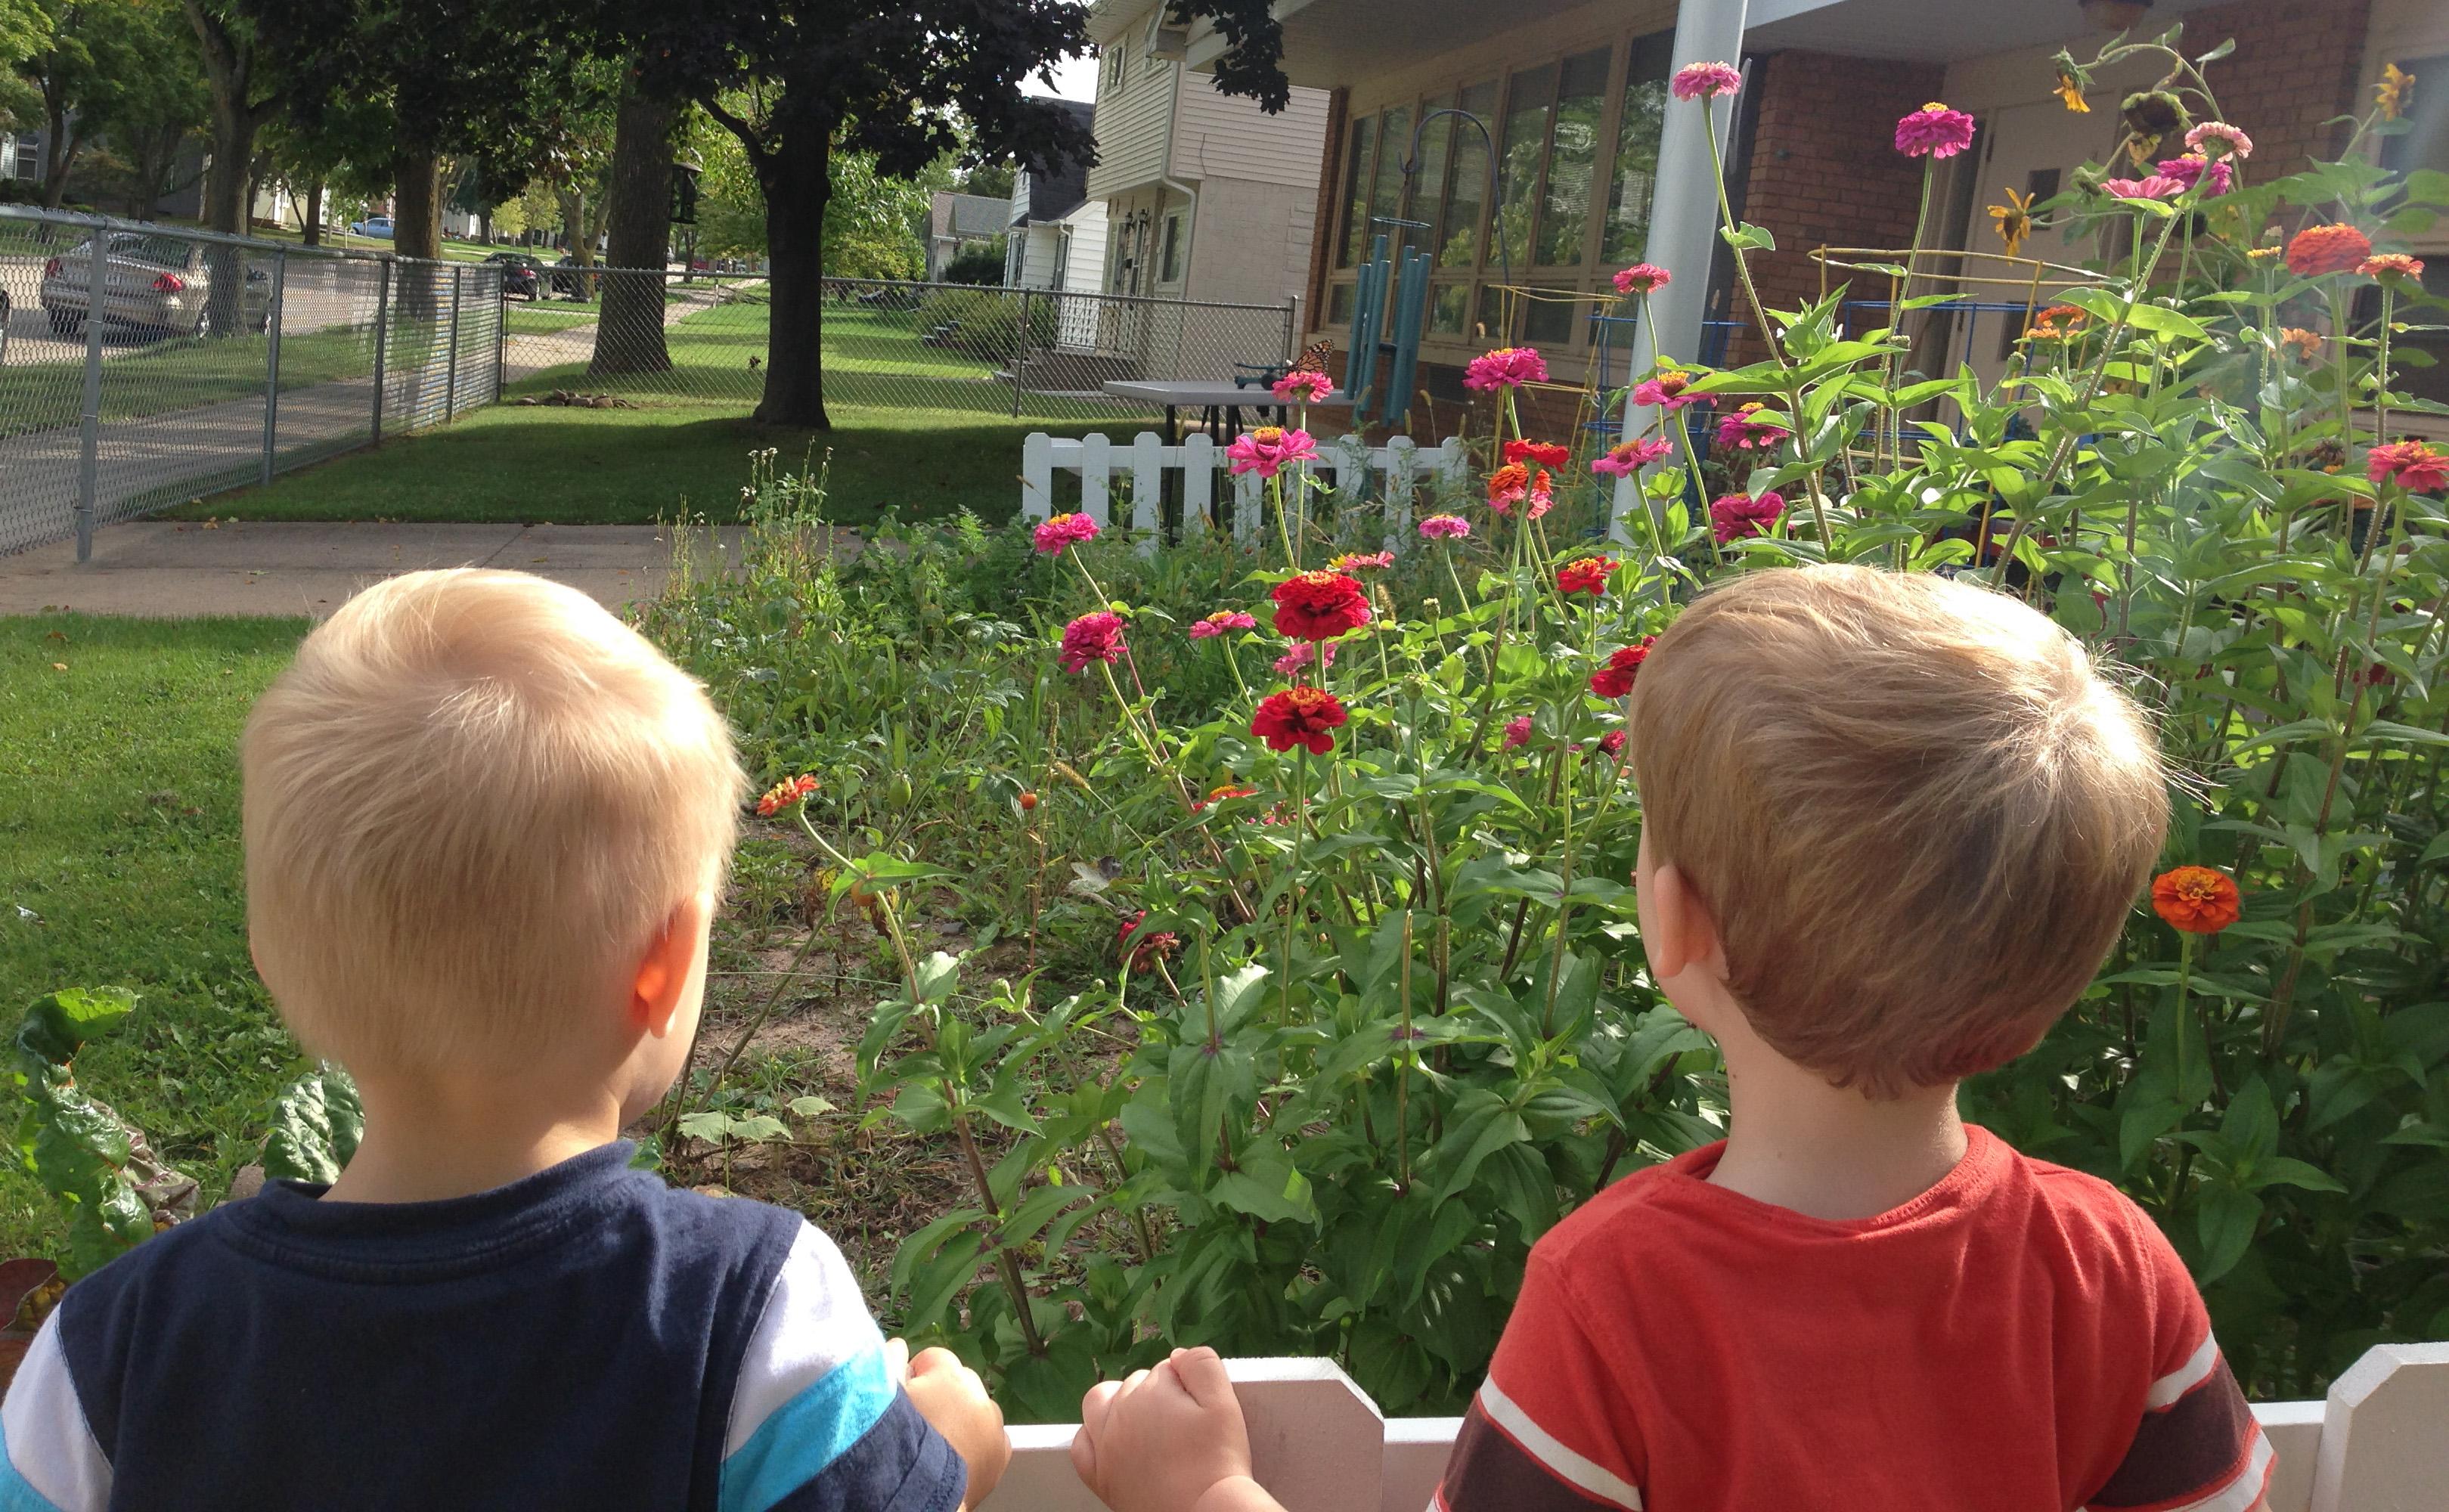 Testimonials for Community Child Care Center